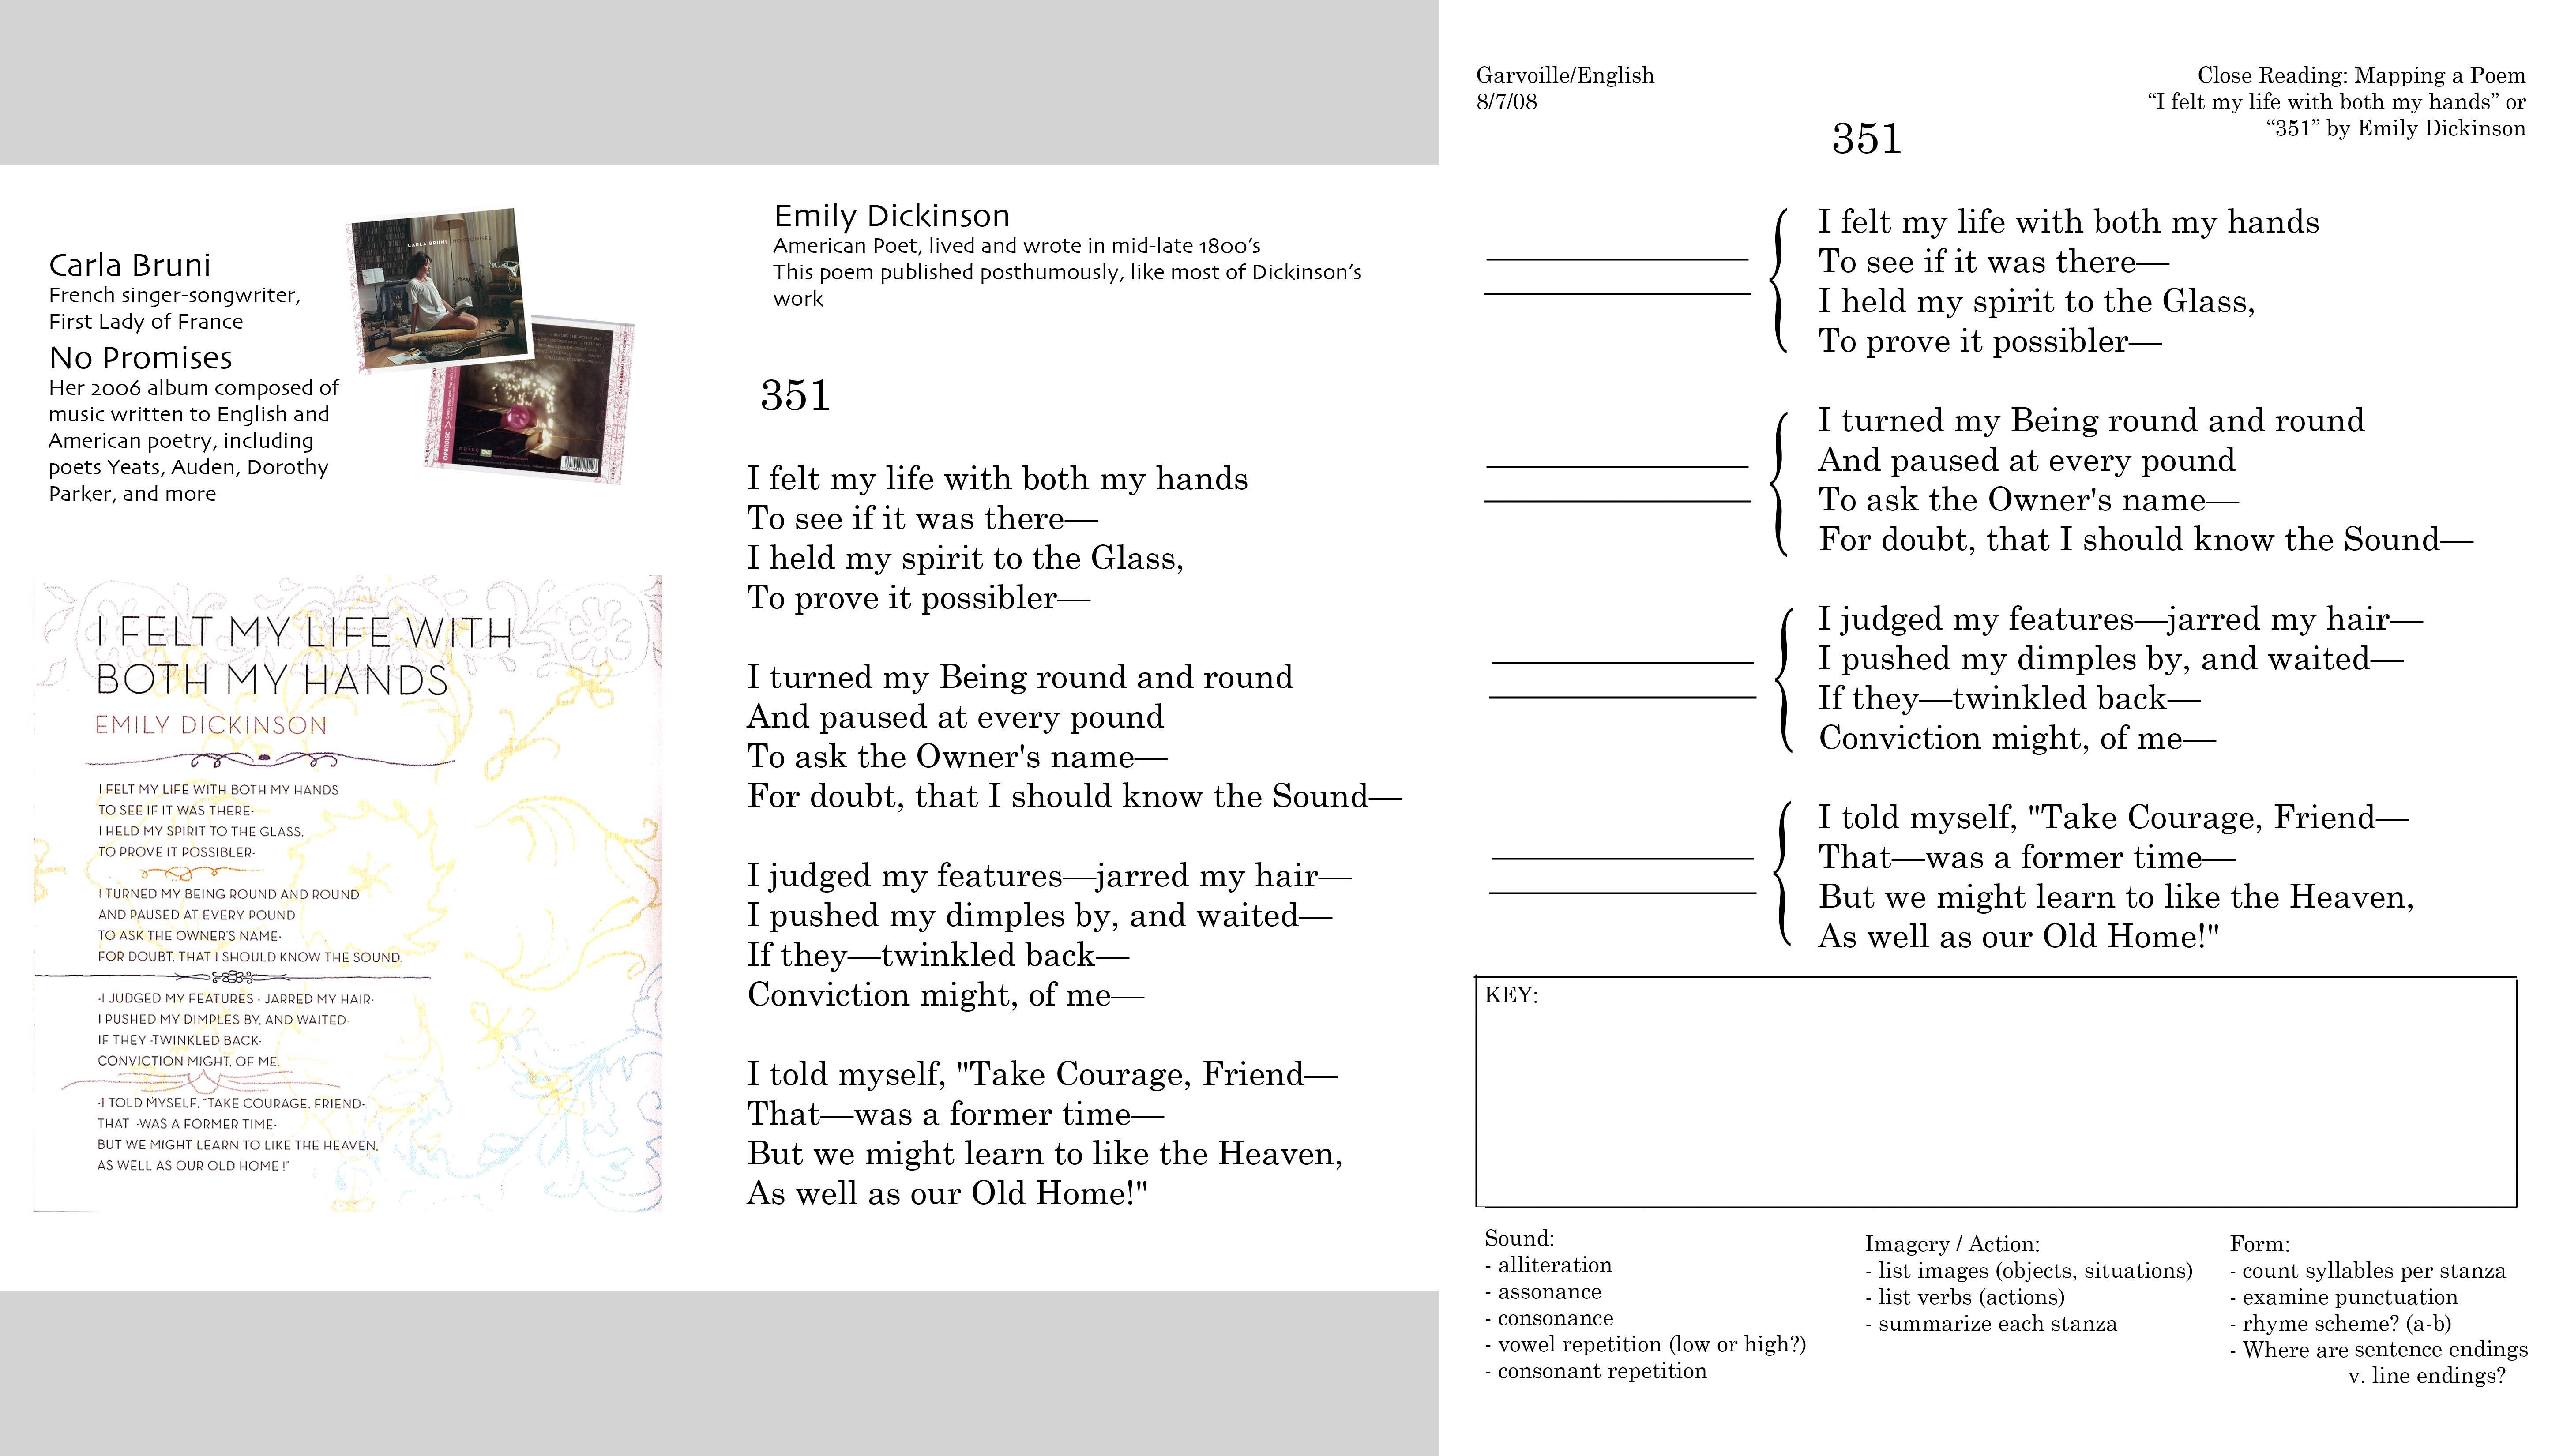 Worksheets Rhyme Scheme Worksheet poetry through song ms garvoilles english i